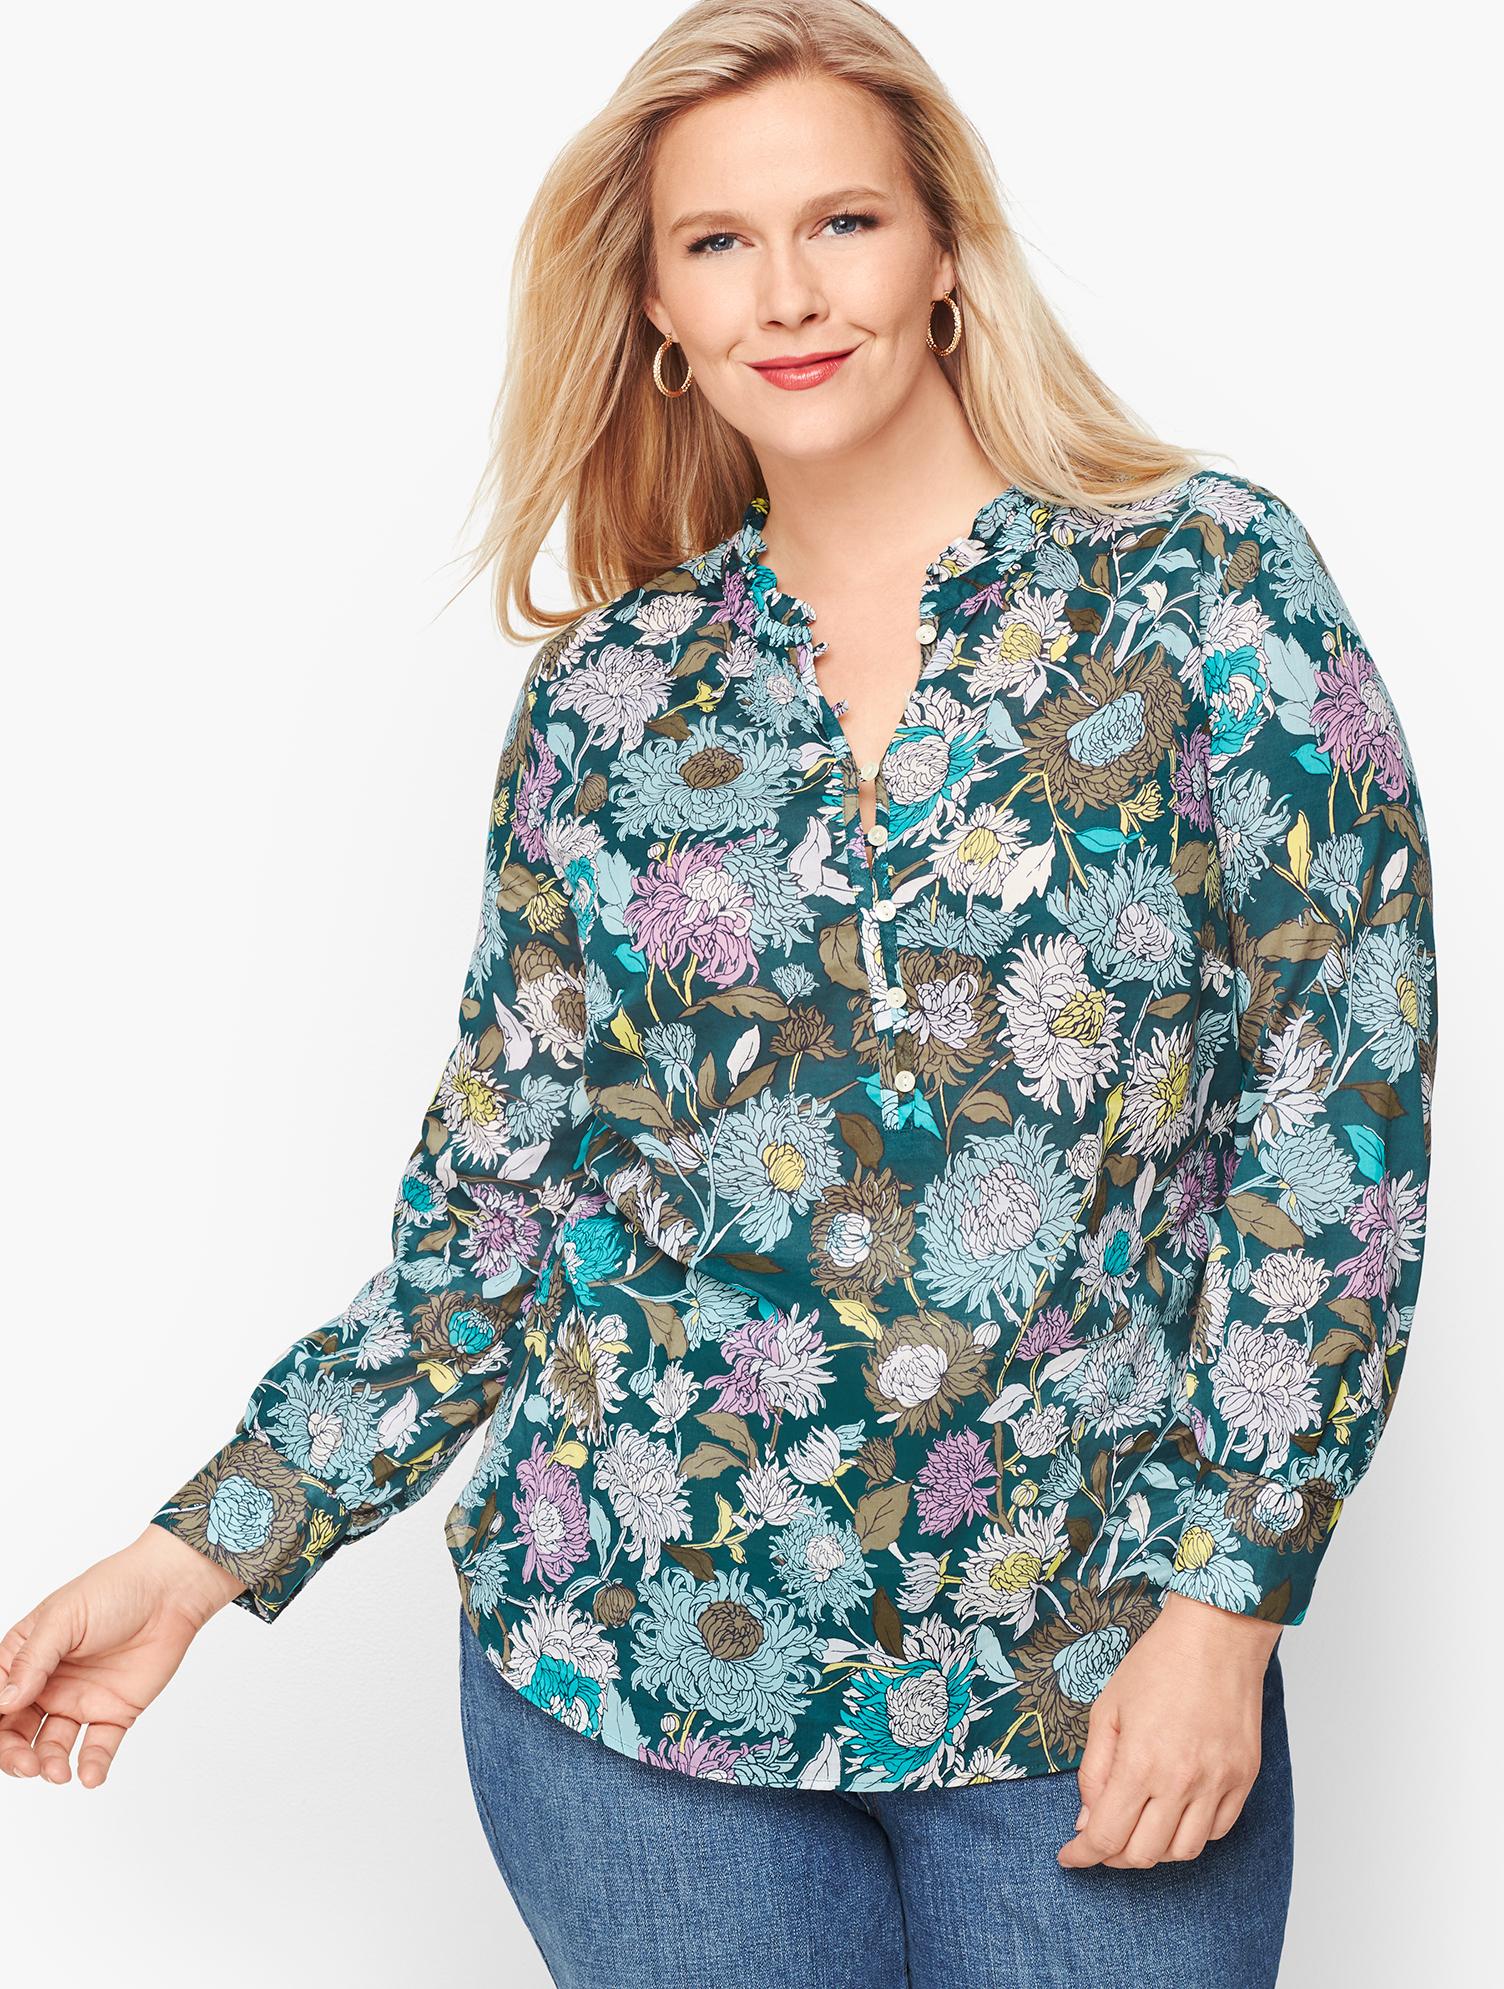 60s Shirts, T-shirt, Blouses, Hippie Shirts Feminine Floral Popover - TWILIGHT-TEAL - 3X - Talbots $62.65 AT vintagedancer.com